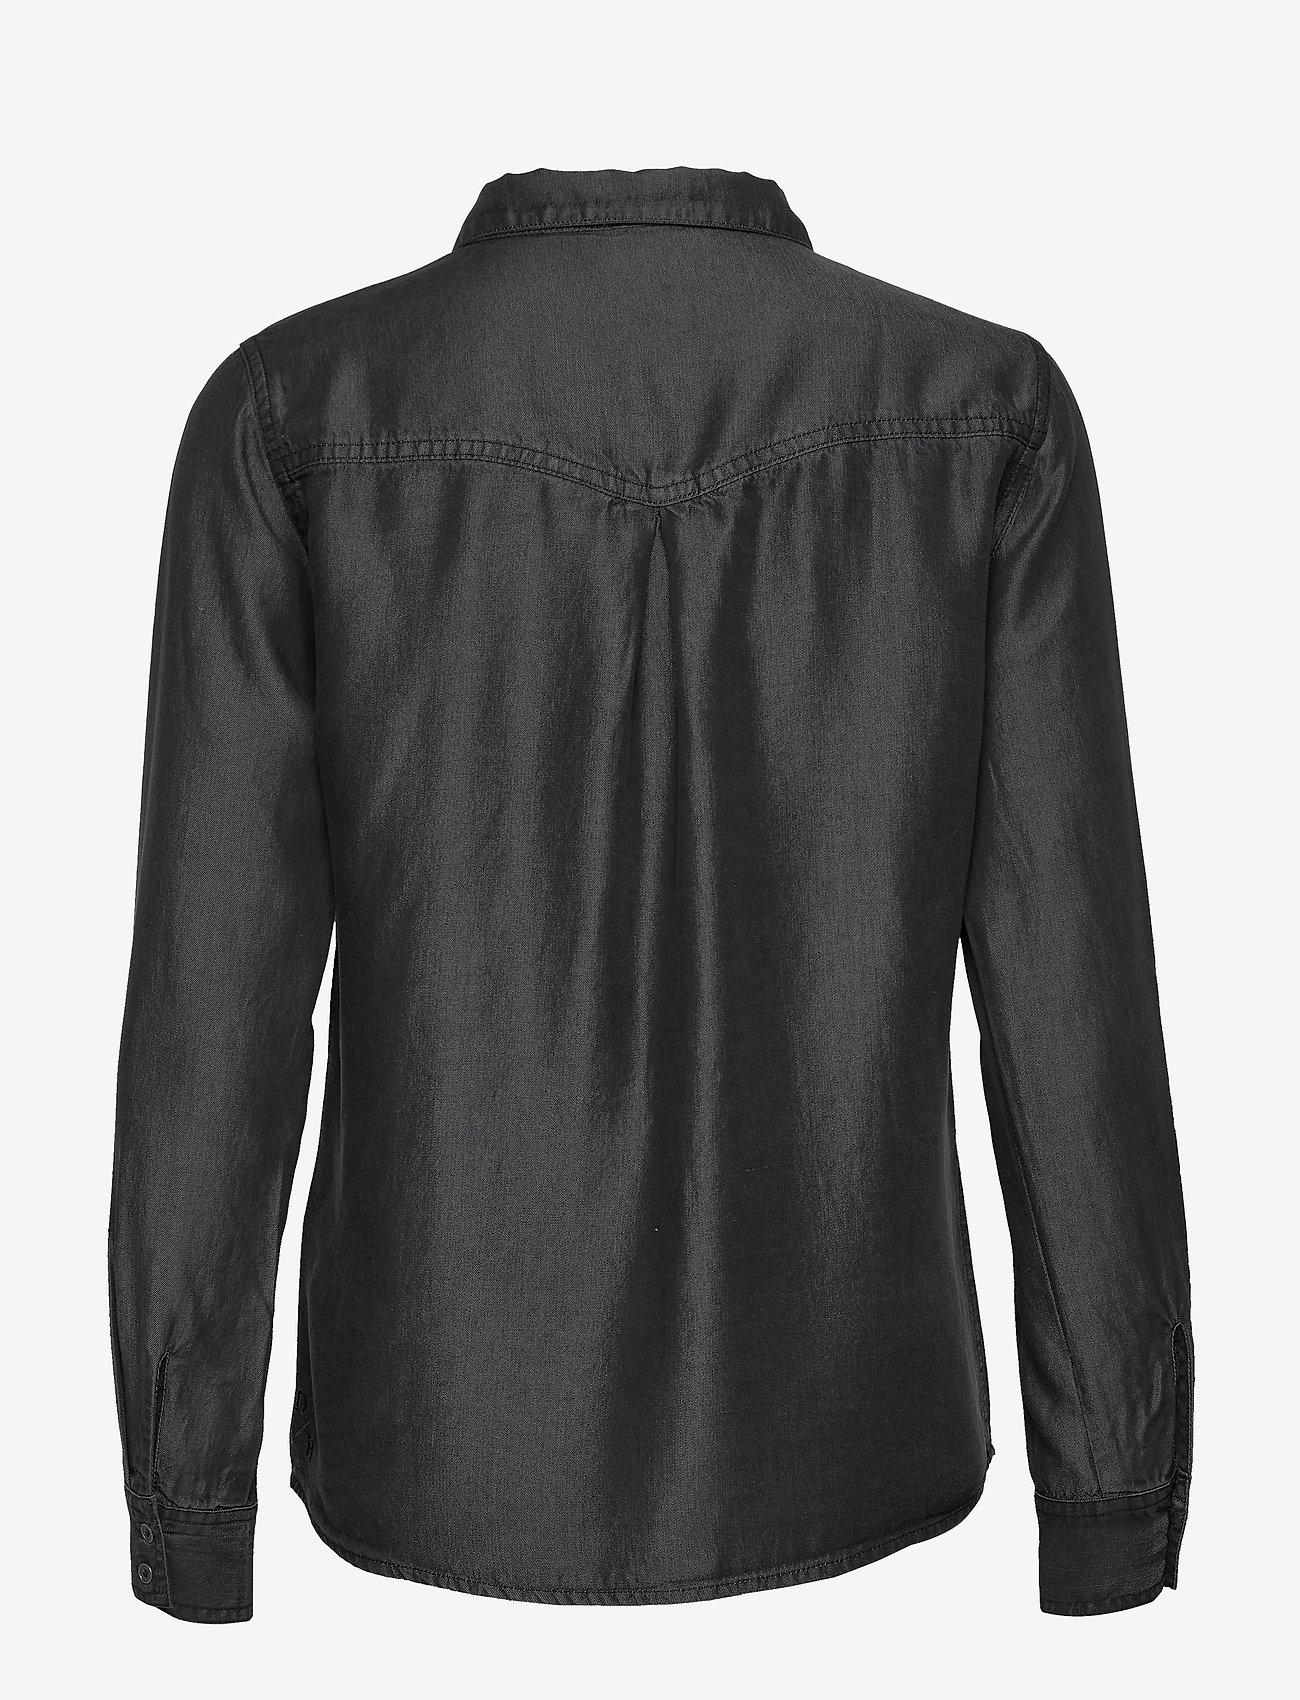 Denim Hunter - 15 THE DENIM SHIRT - jeansskjortor - grey wash - 1